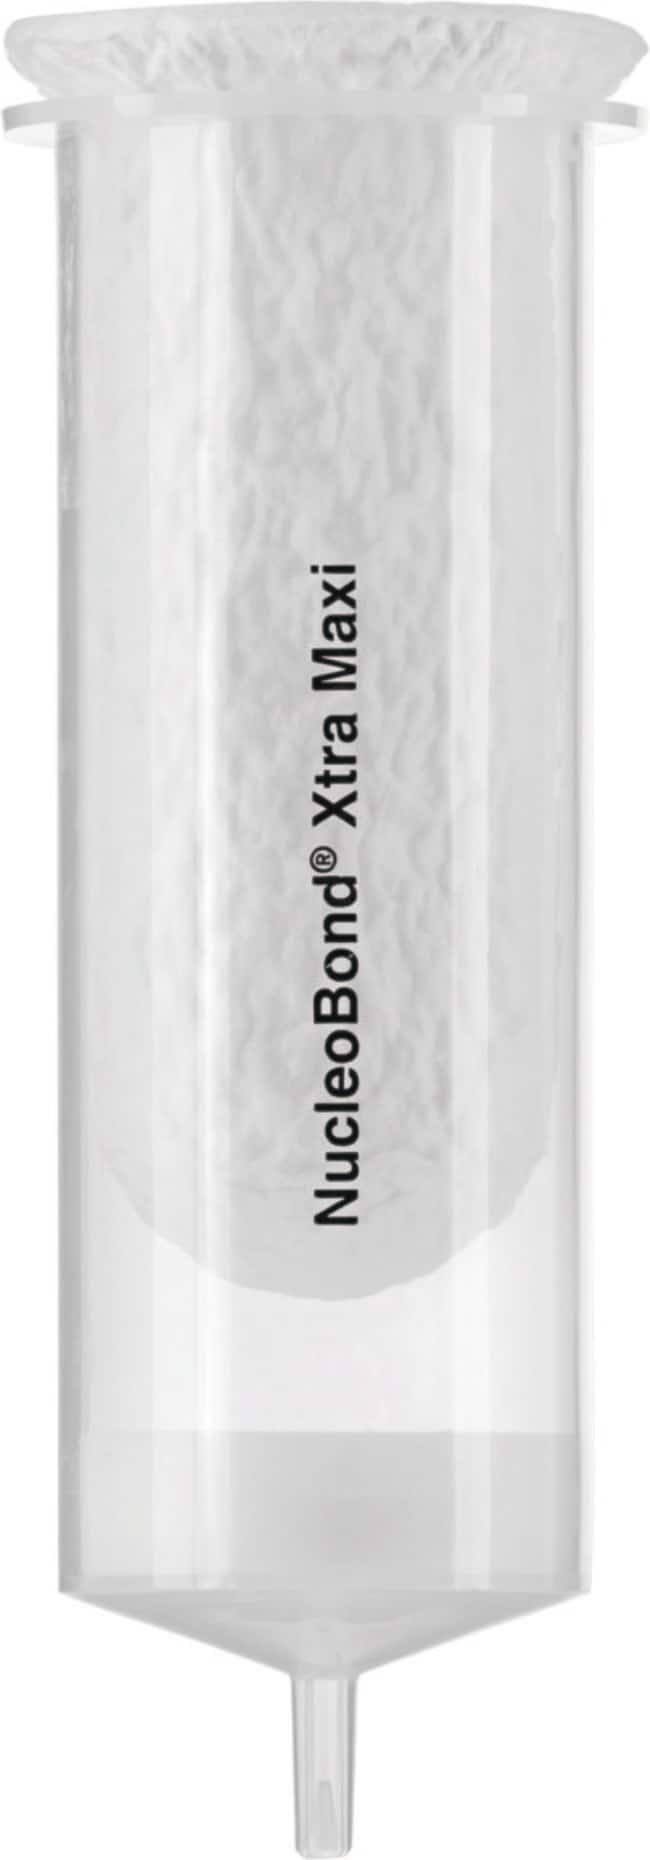 Macherey-Nagel™NucleoBond™ Xtra Maxi Kits No. of Reactions: 2 Products